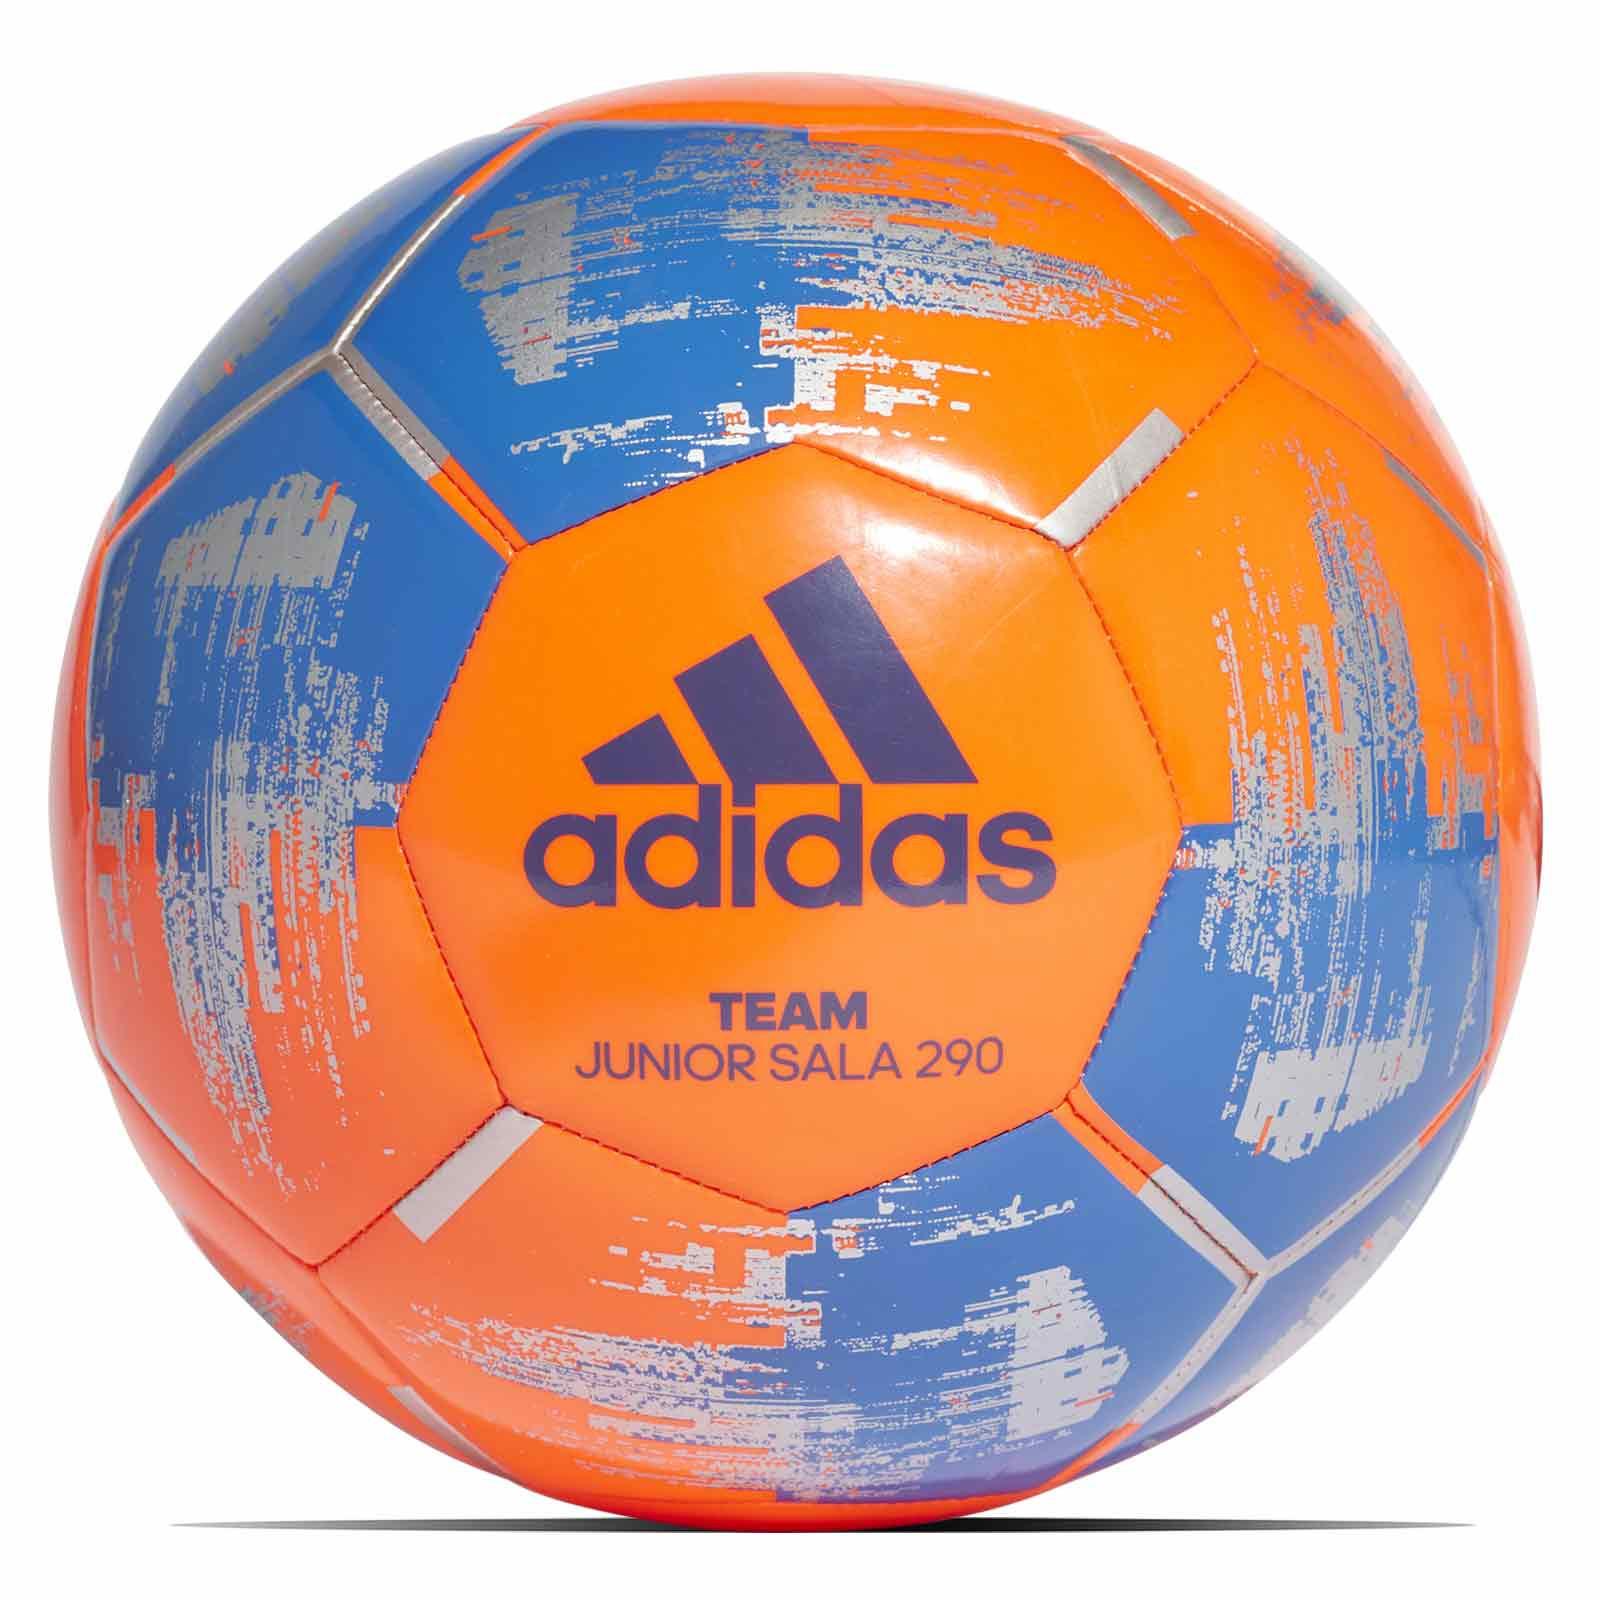 Triturado Lubricar En honor  Balón adidas Team Junior Sala 290 talla 4 | futbolmania